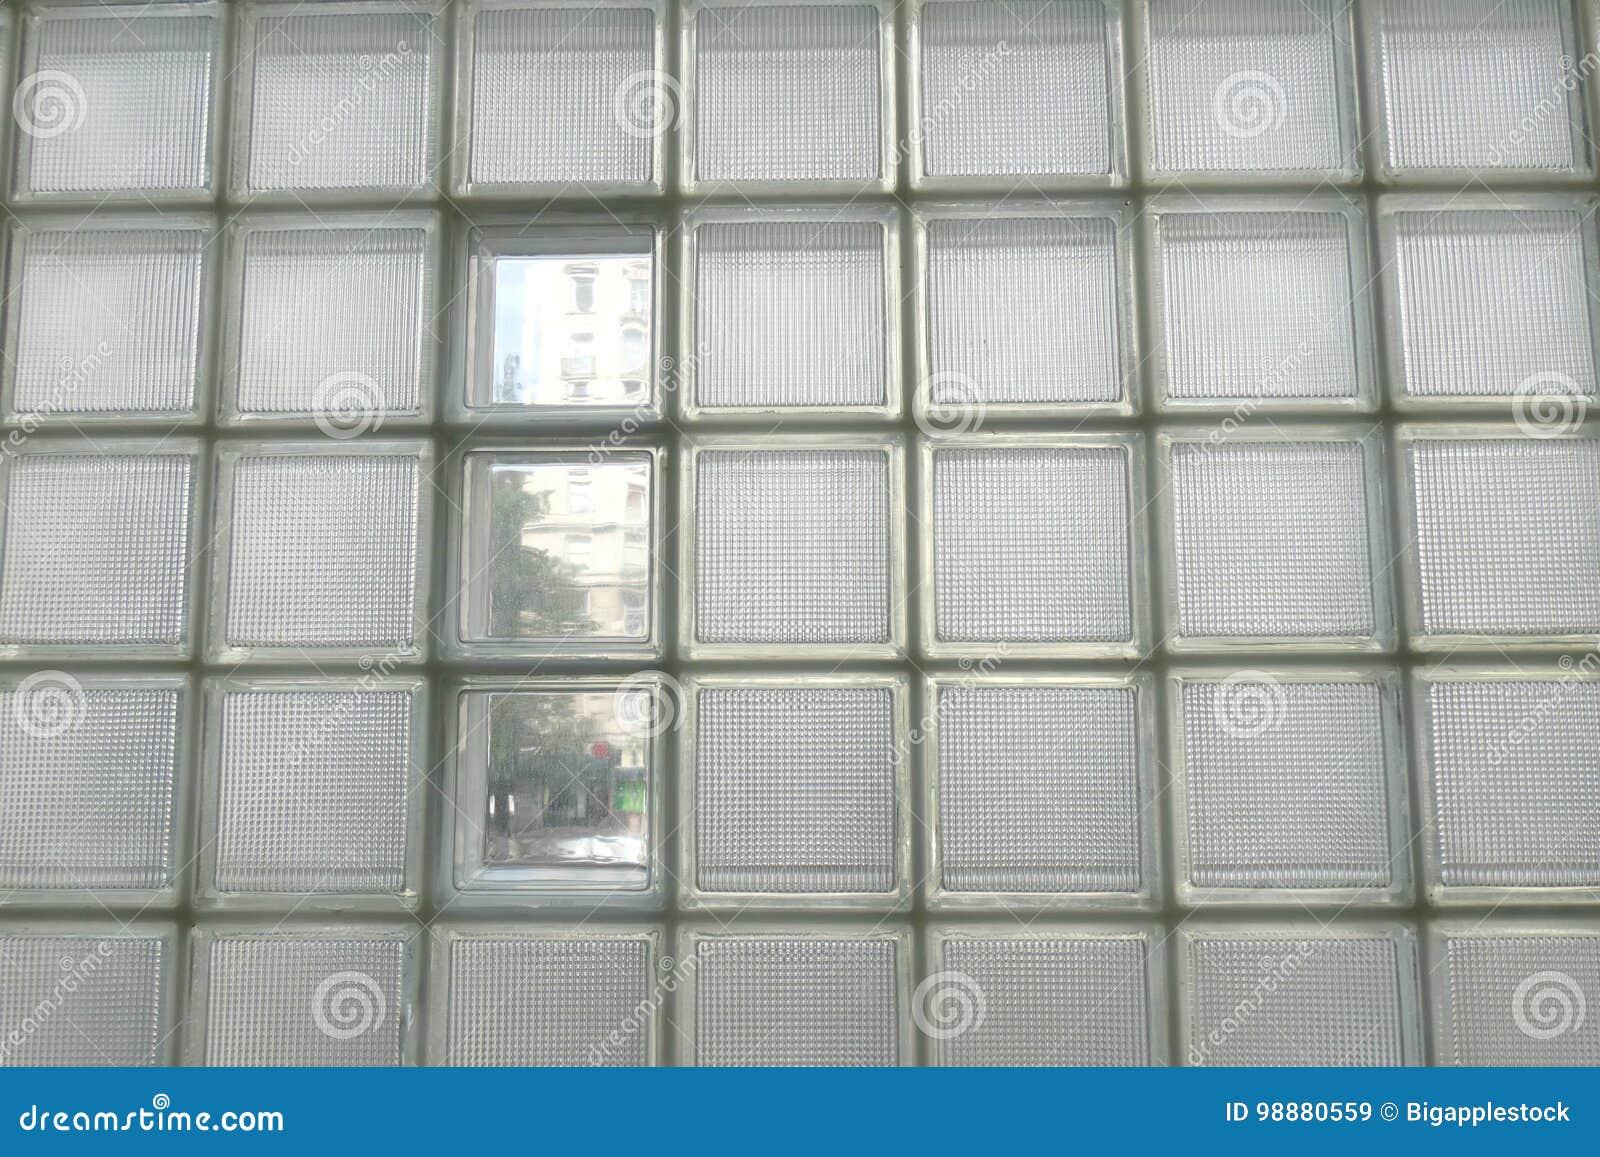 mur de bloc en verre image stock image du glace. Black Bedroom Furniture Sets. Home Design Ideas